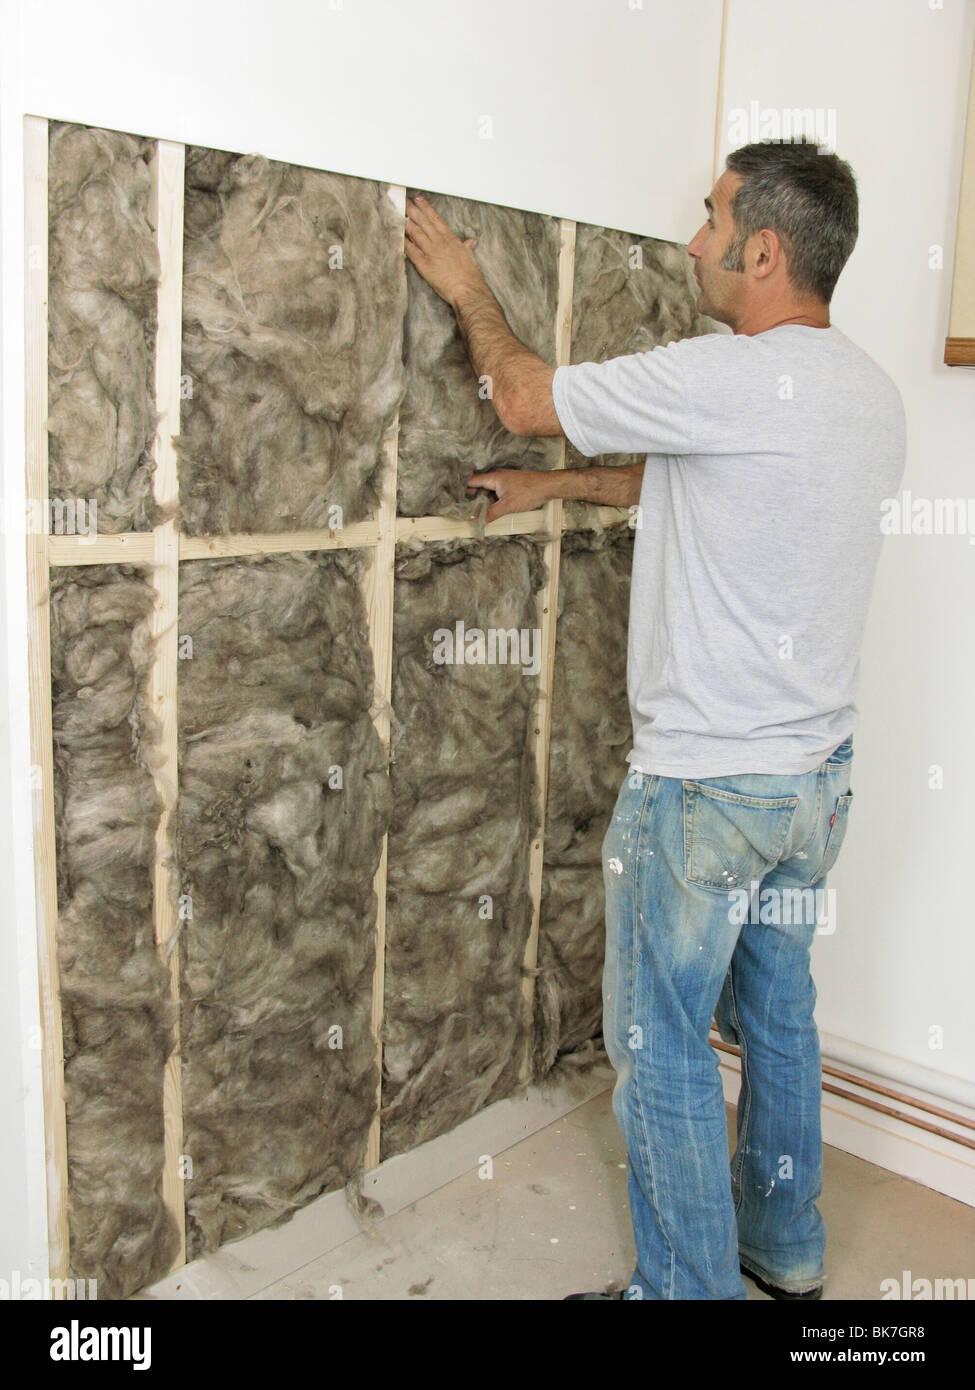 Cavity Wall Insulation Carbon Black : Insulation wall stock photos